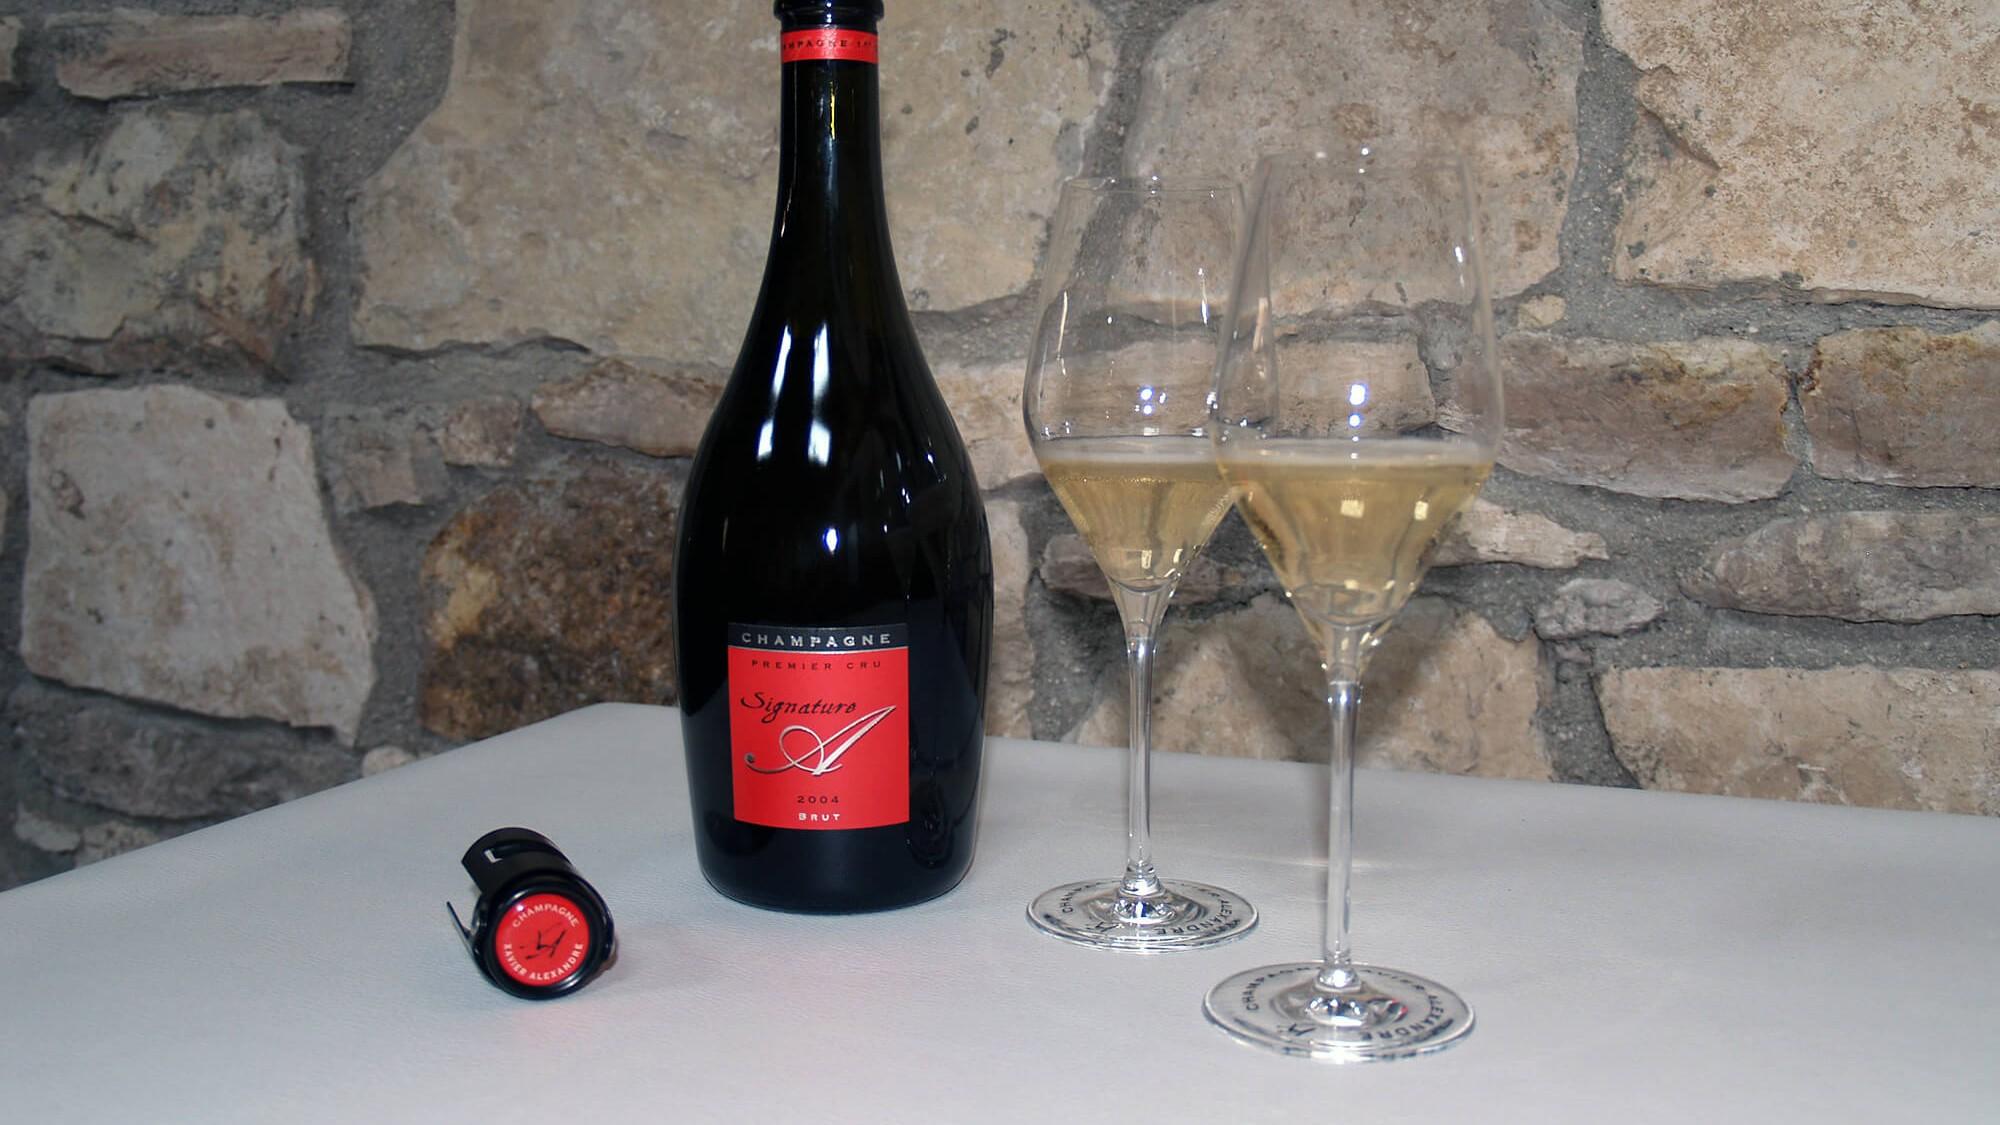 Champagne Xavier Alexandre Signature Brut 1er Cru 2004